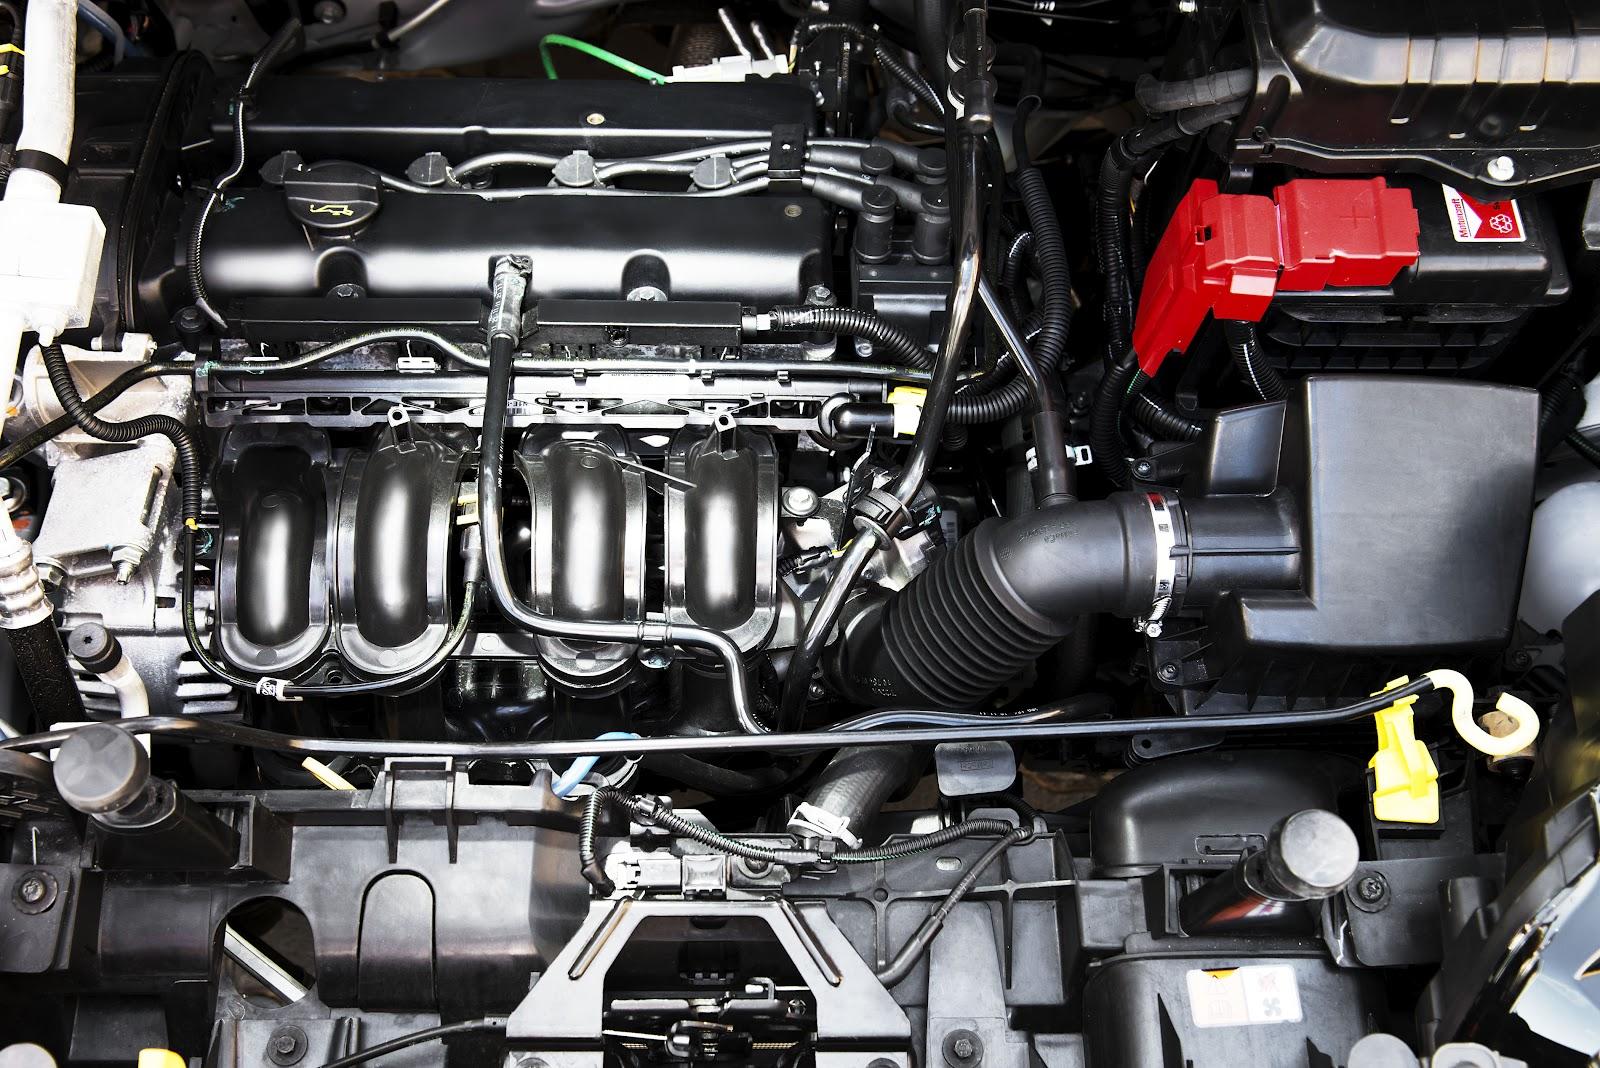 Motores sigma e duratec de alumínio